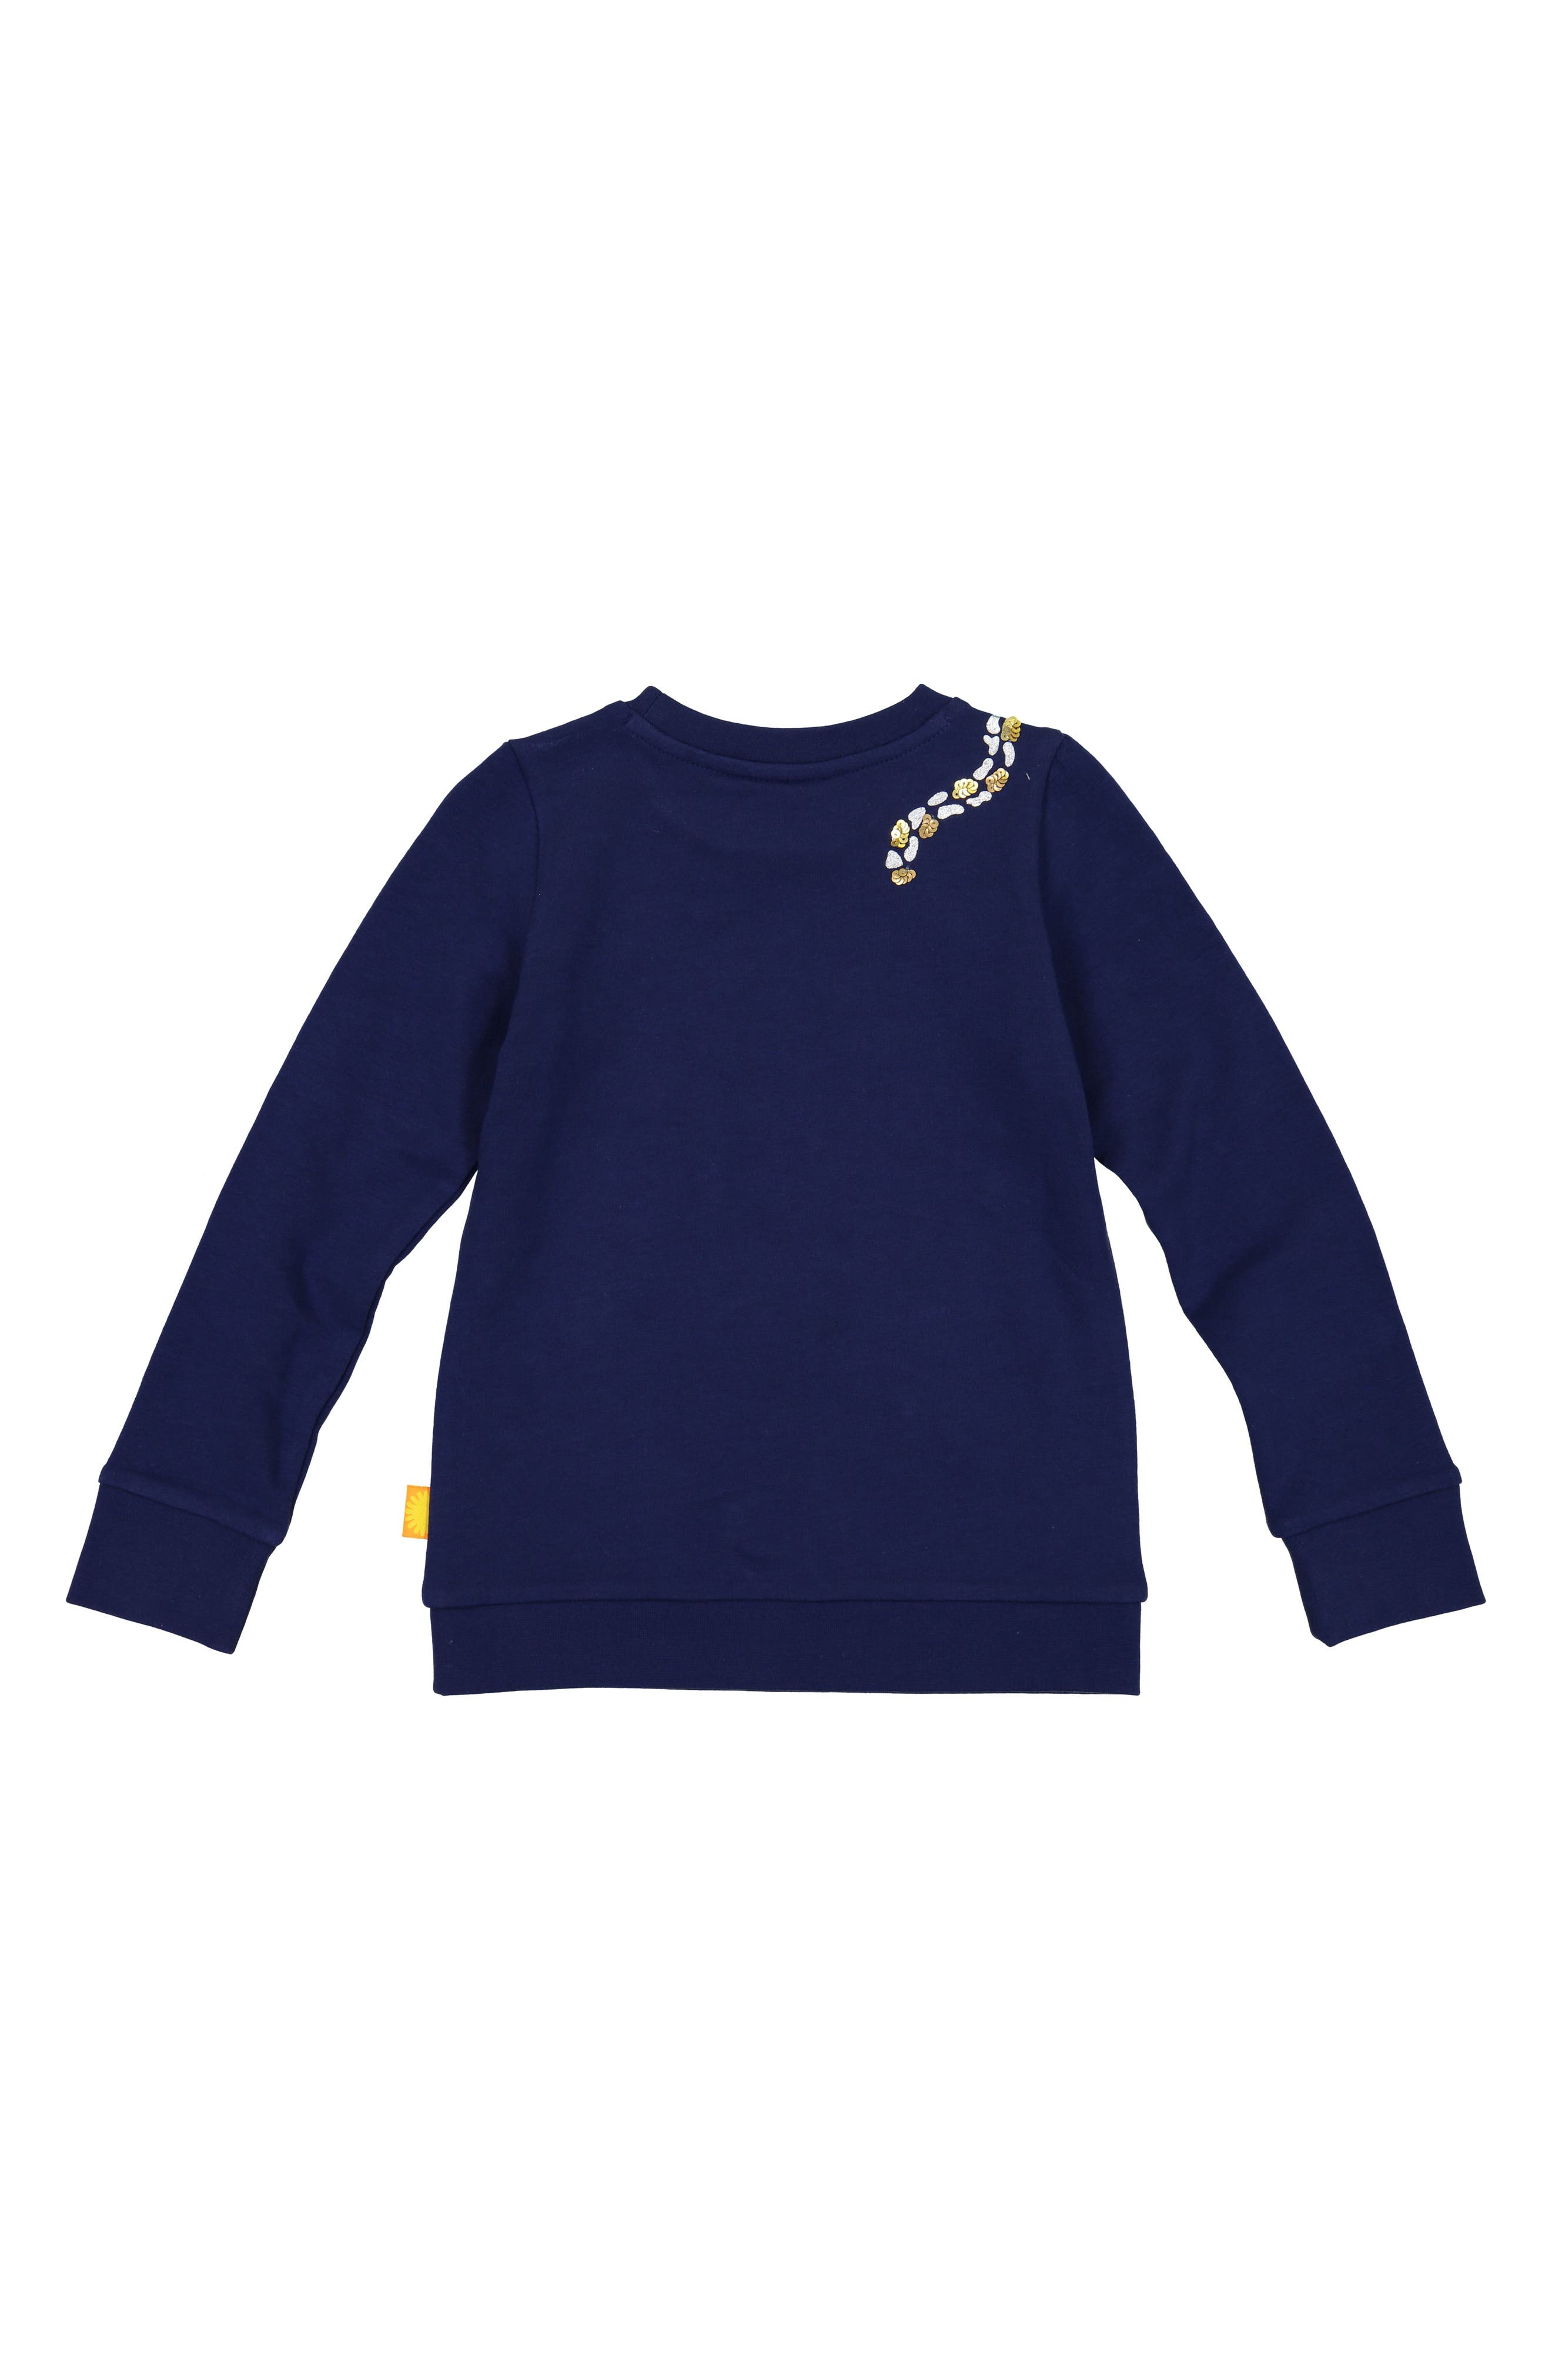 Cheetah Organic Cotton Sweatshirt,                             Alternate thumbnail 3, color,                             NAVY